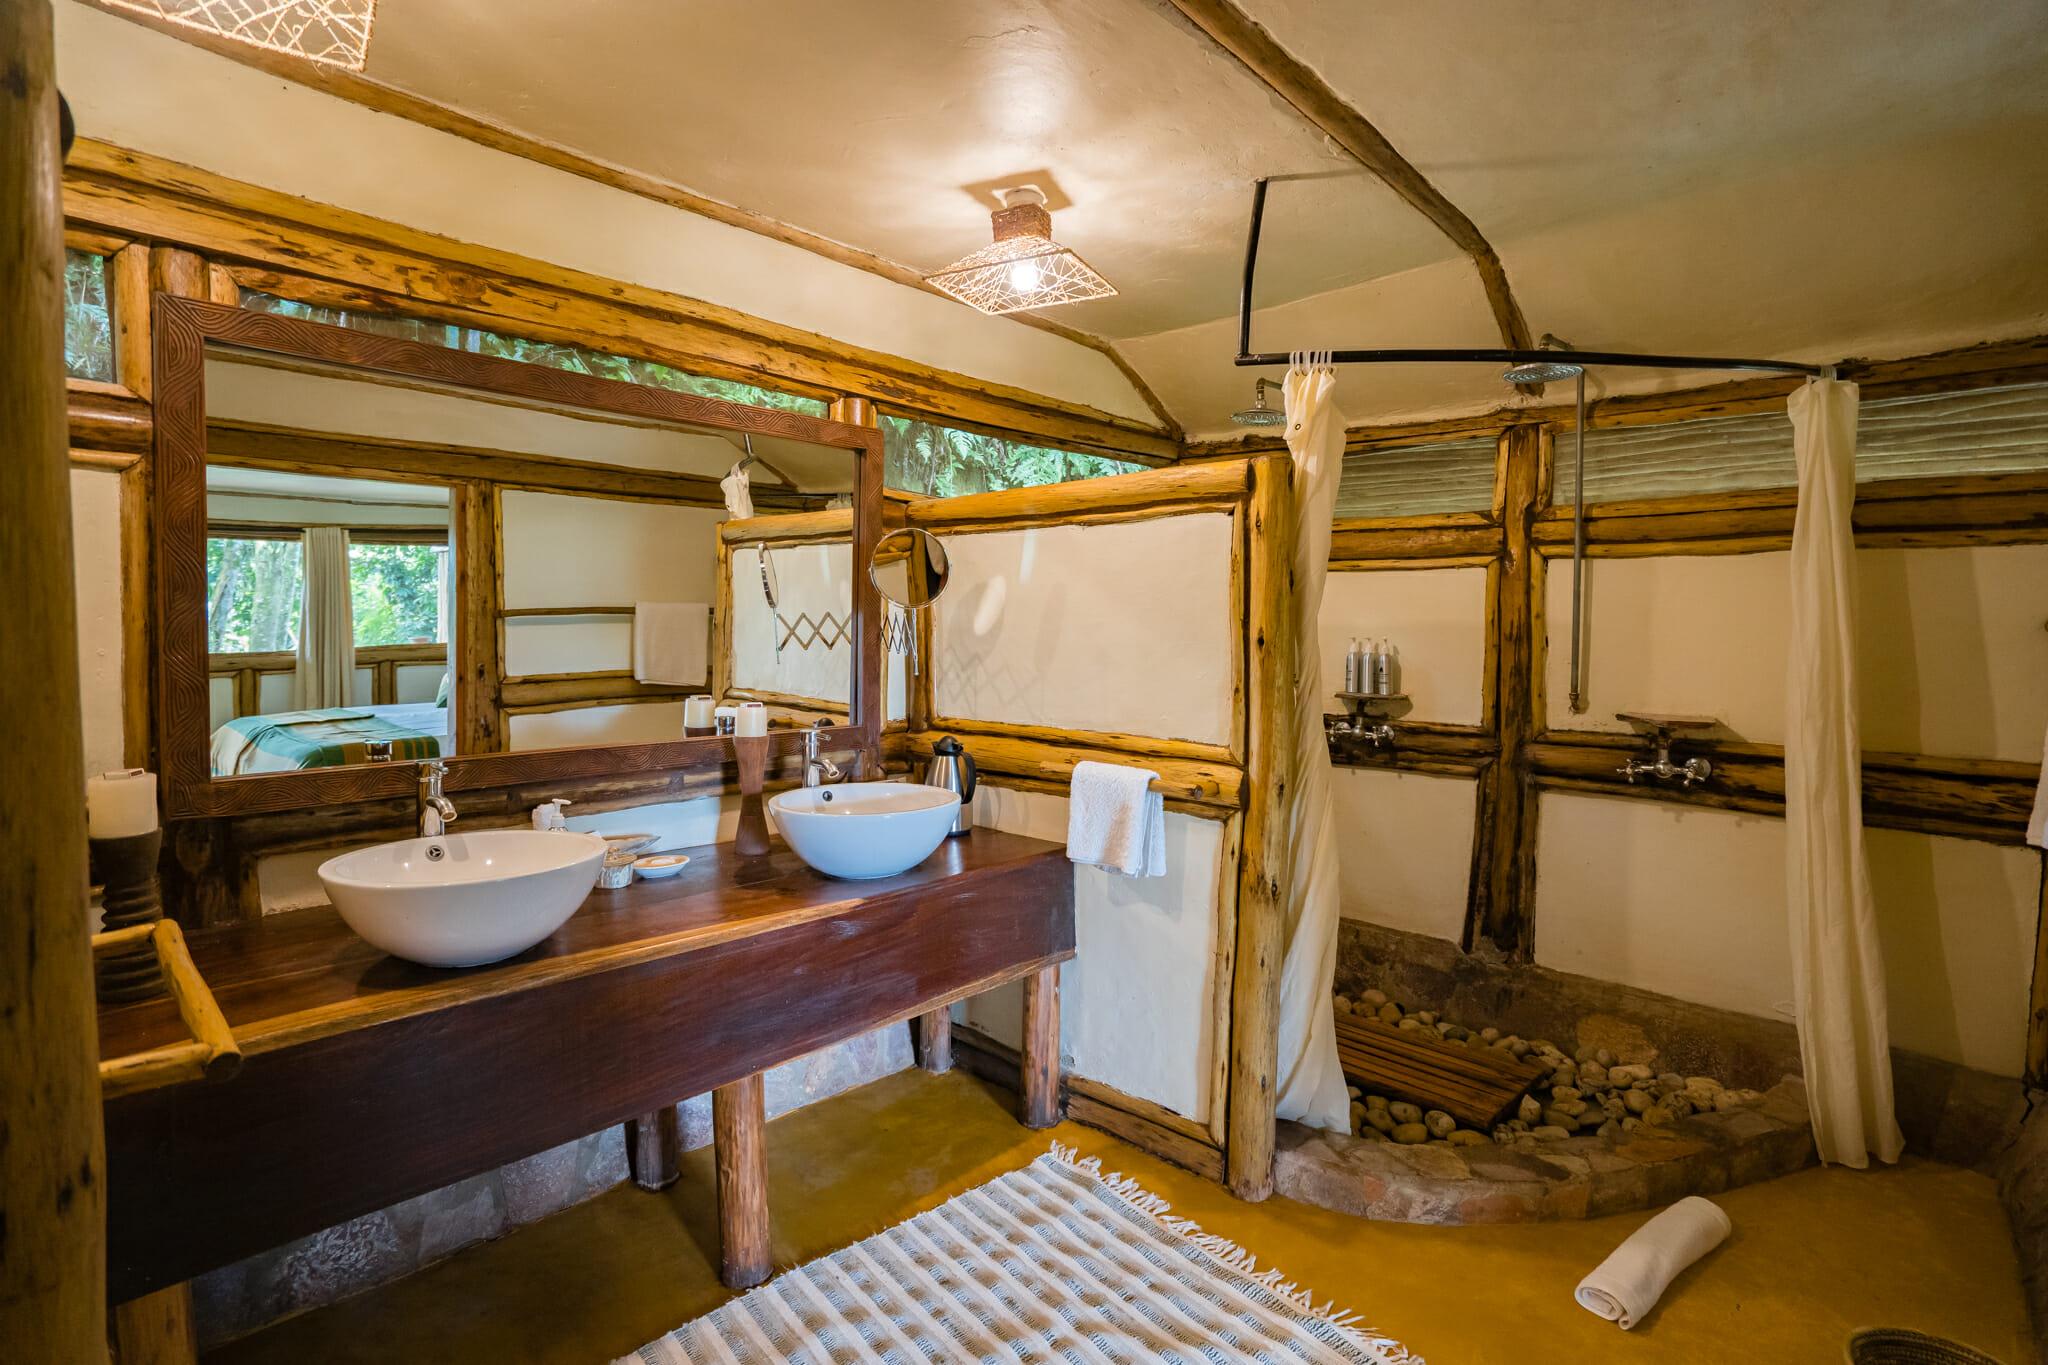 salle de bain du buhoma lodge au coeur de la foret de bwindi en ouganda